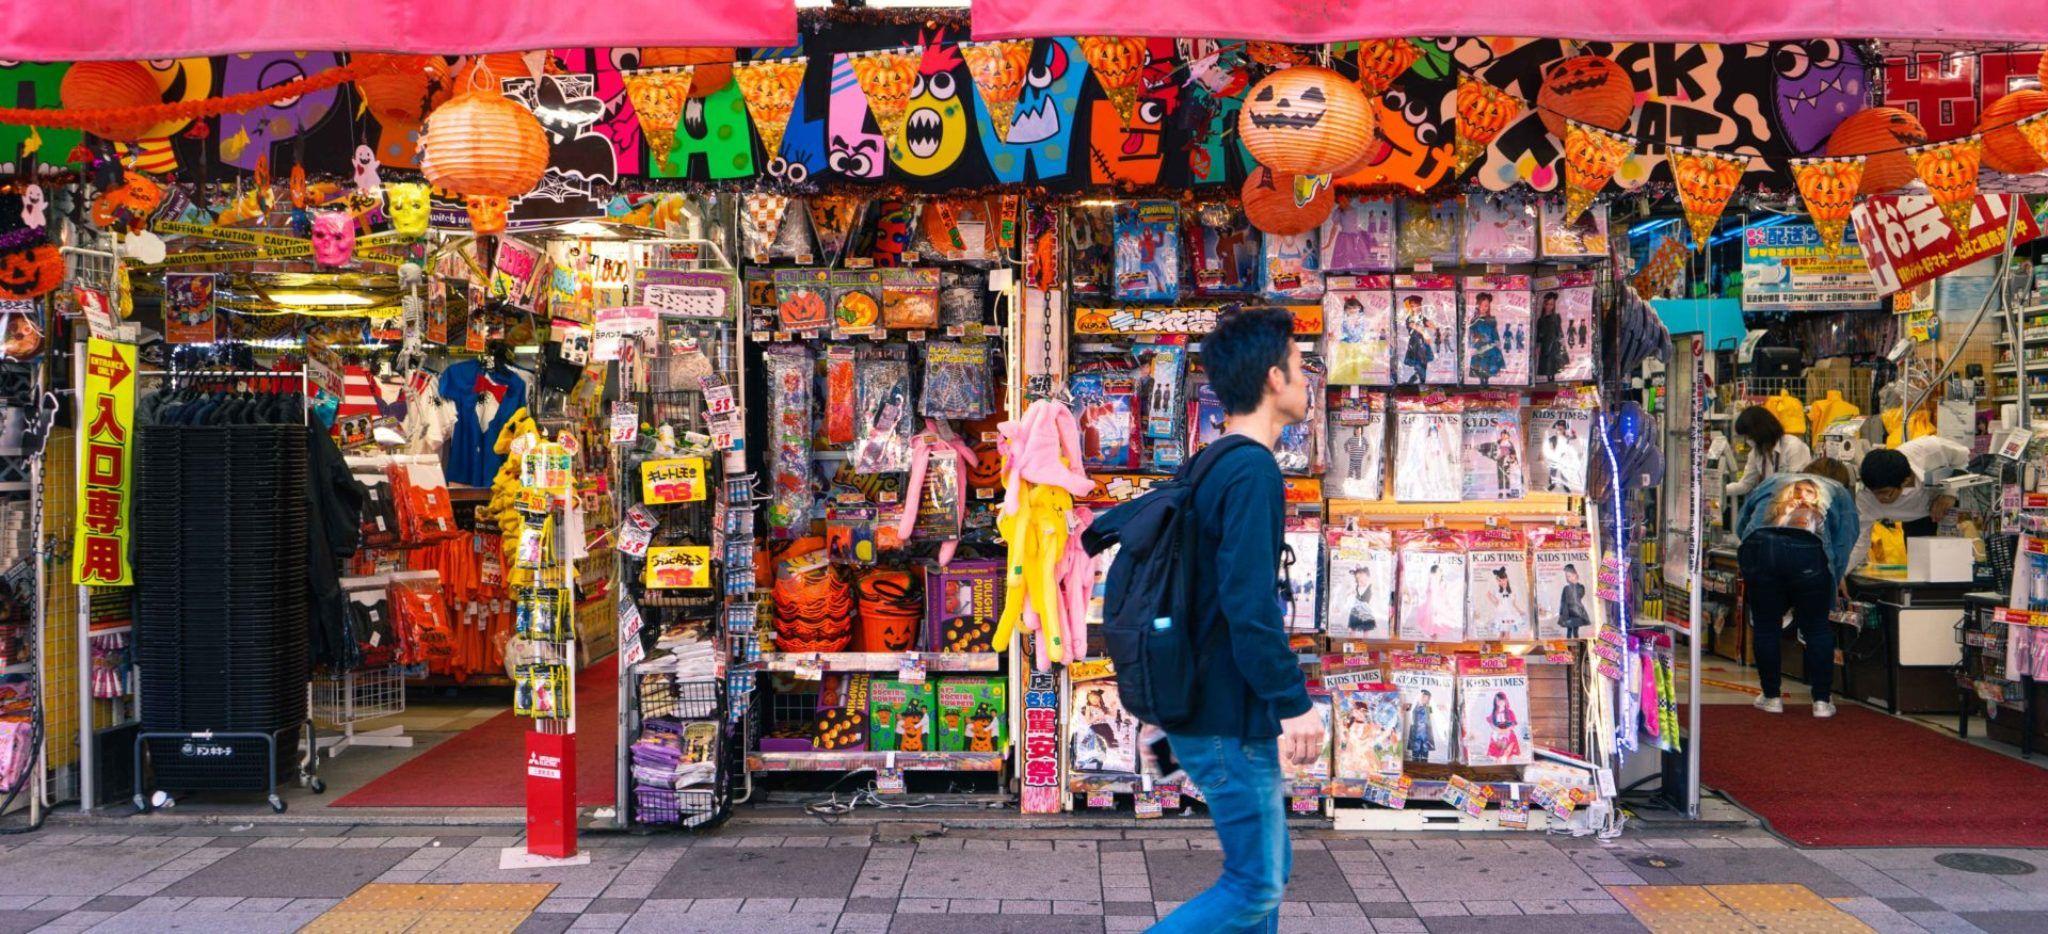 Halloween customes in Japan